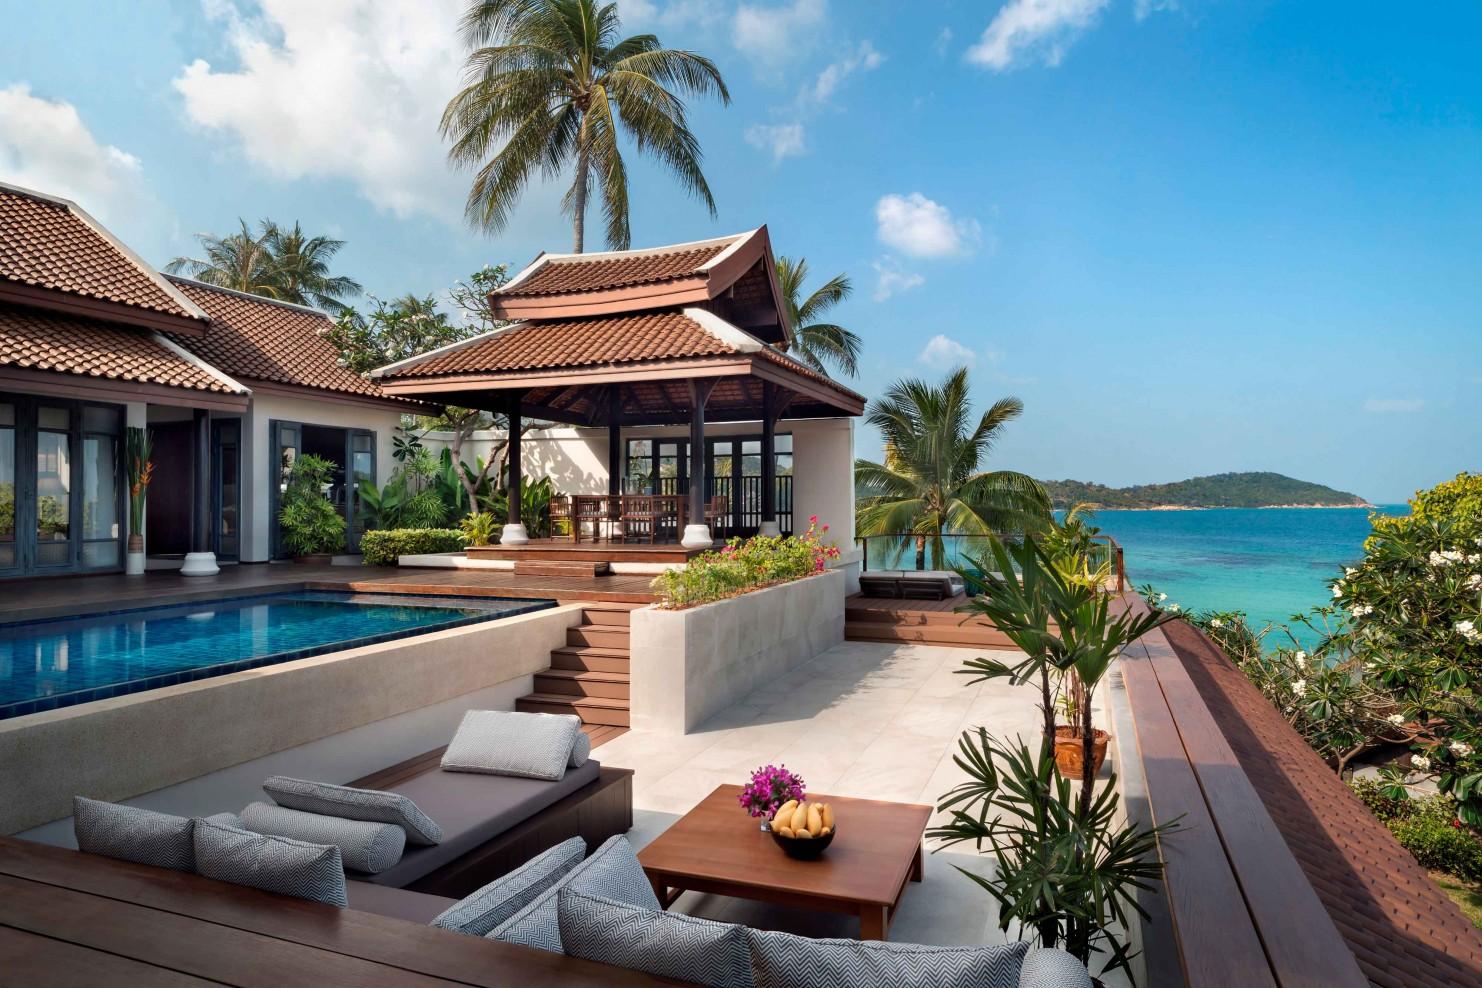 ac03a55f6 Anantara Lawana Resort & Spa hotel | Koh Samui | Smith Hotels